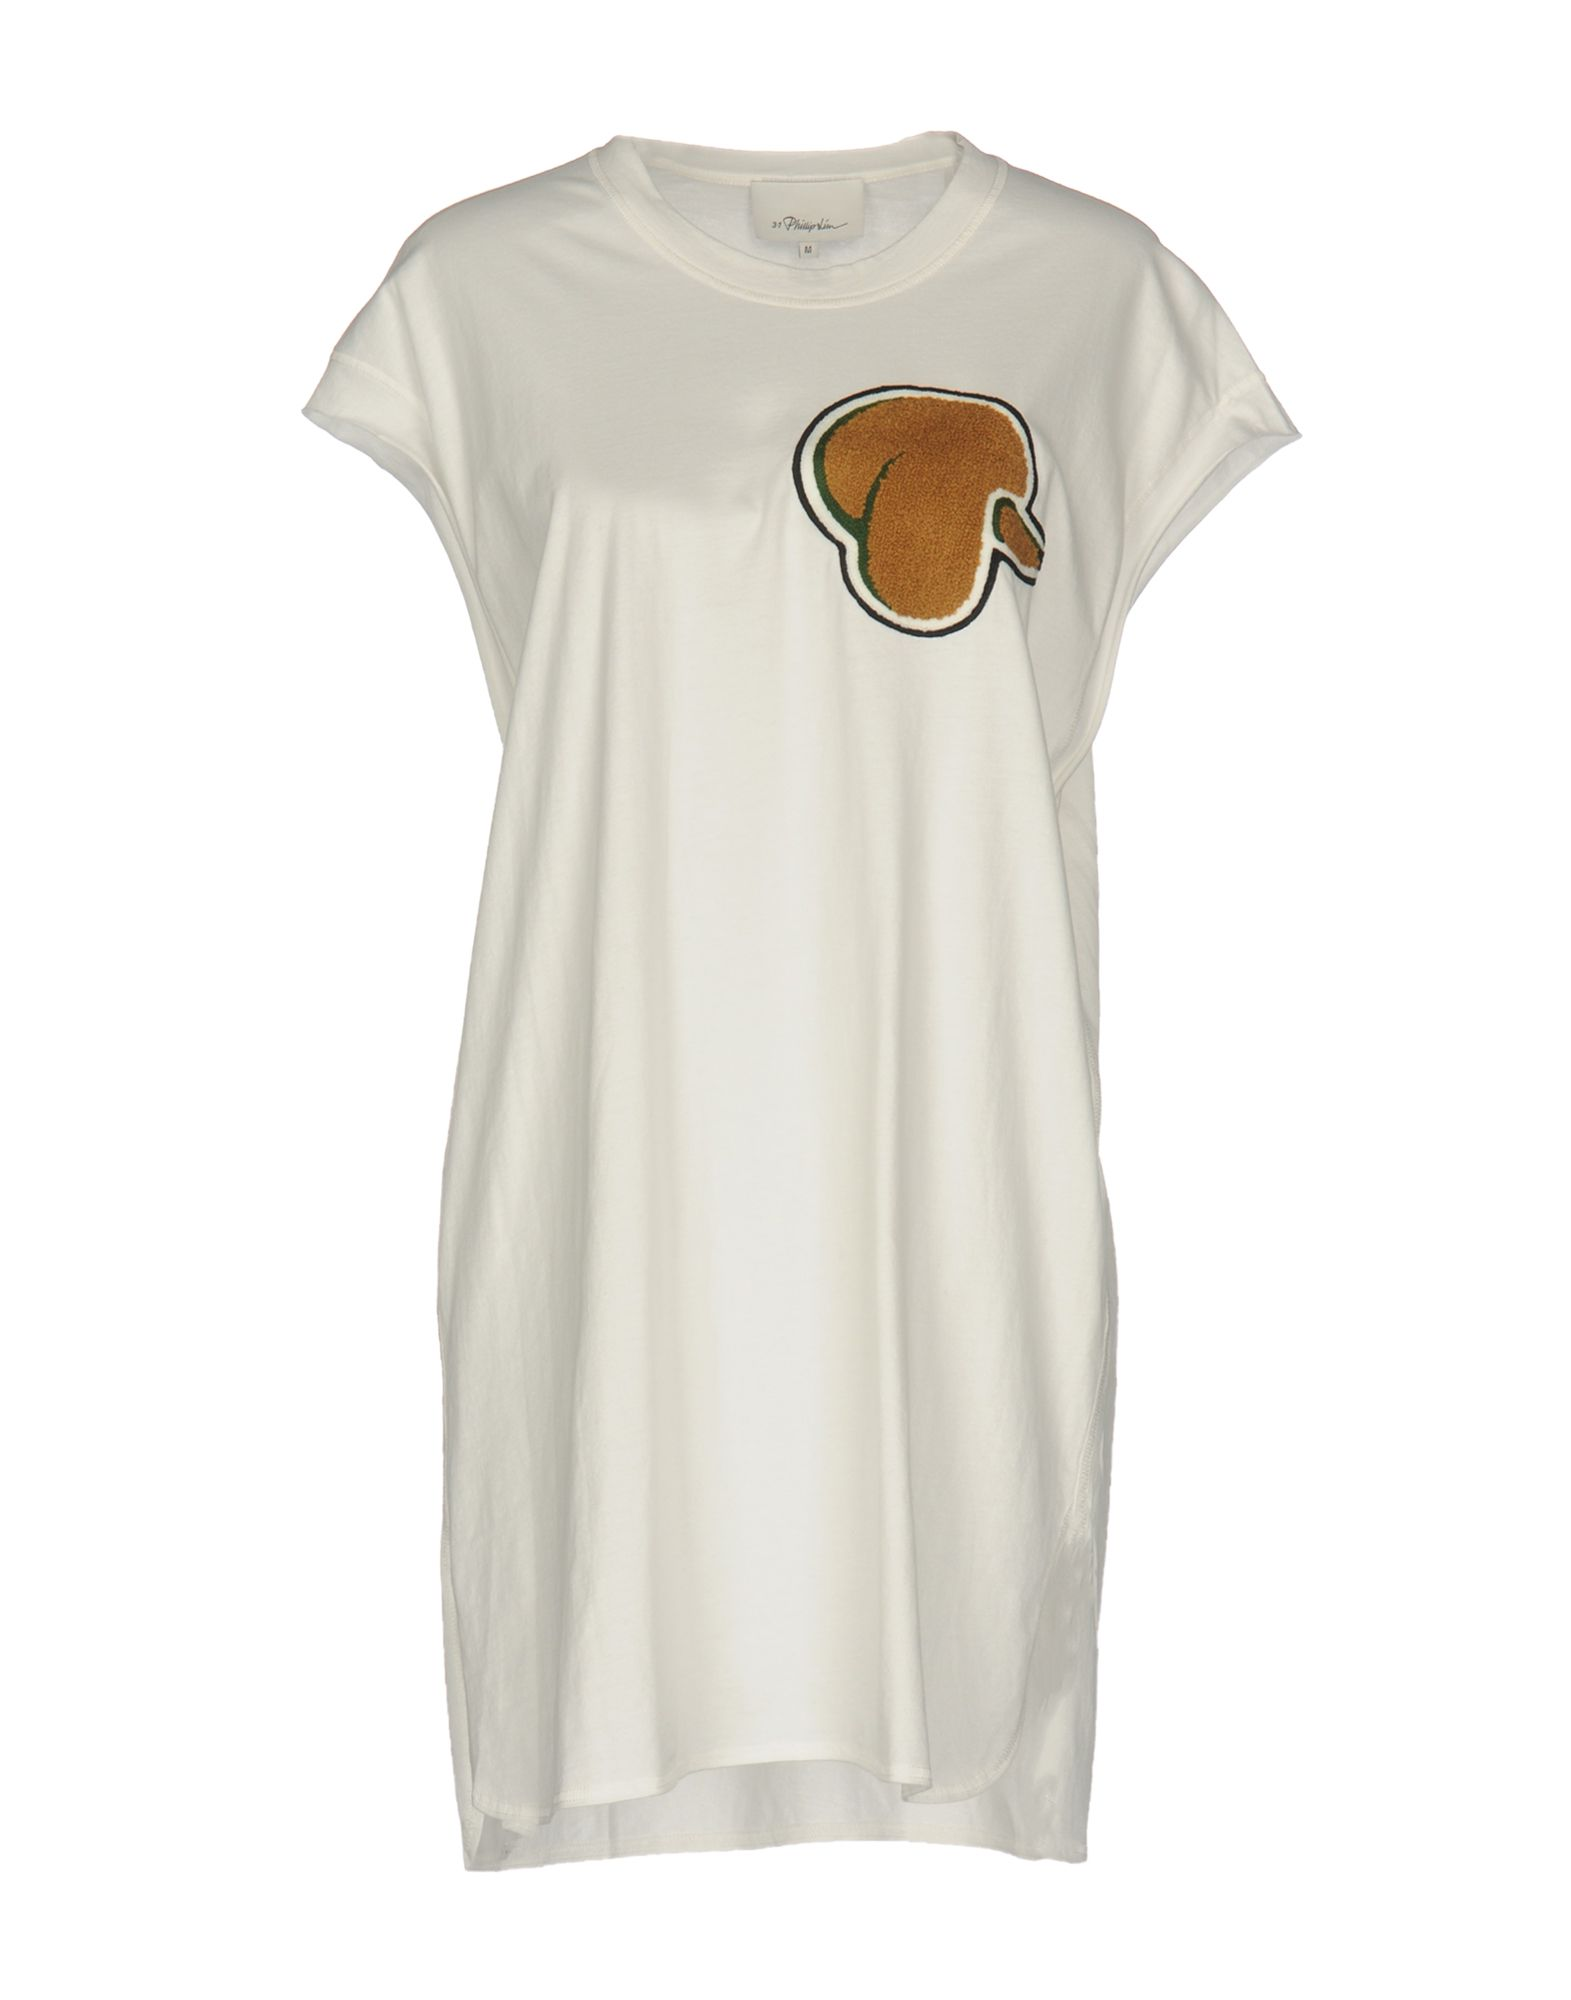 3.1 PHILLIP LIM Футболка 3 1 phillip lim футболка